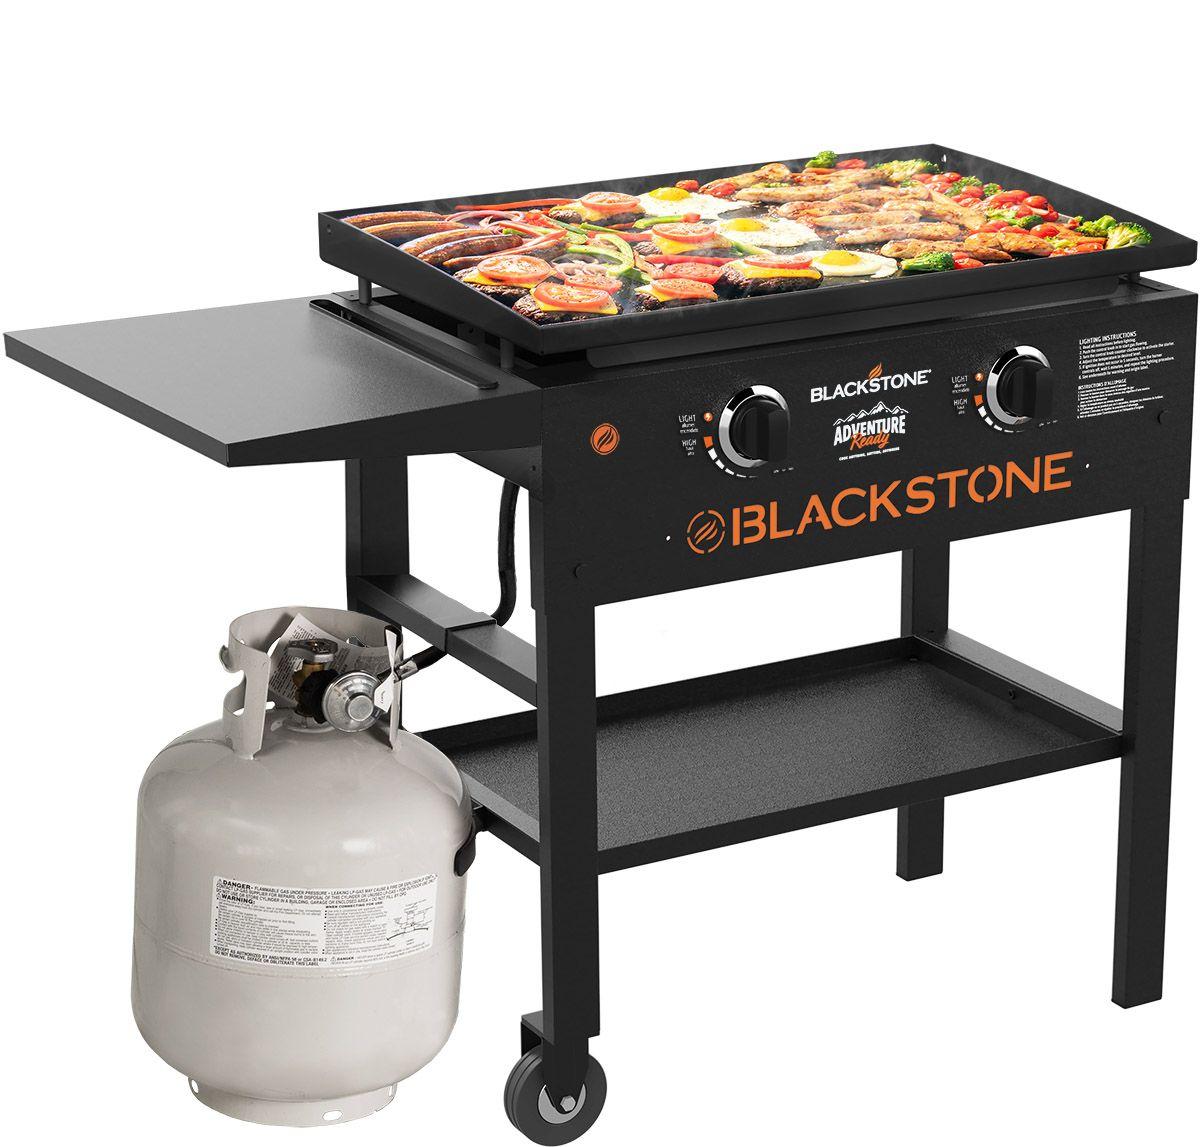 Blackstone Adventure Ready 2 Burner 28 Outdoor Griddle Walmart Com Gas Grill Griddle Grill Griddle Cooking